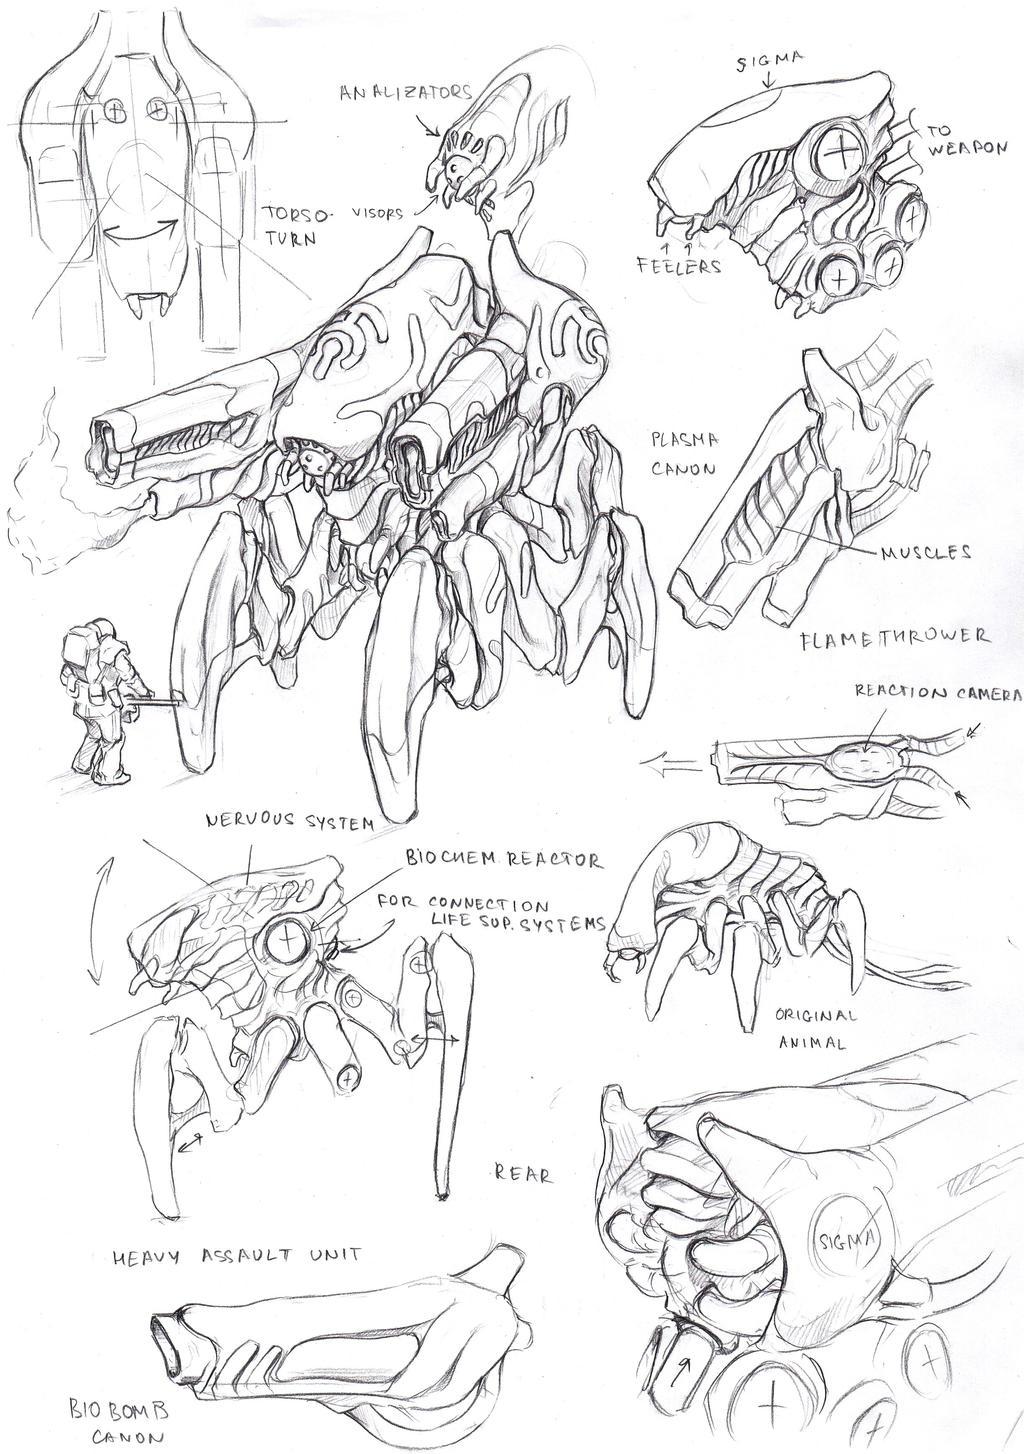 Glorlons bio-tank by TugoDoomER